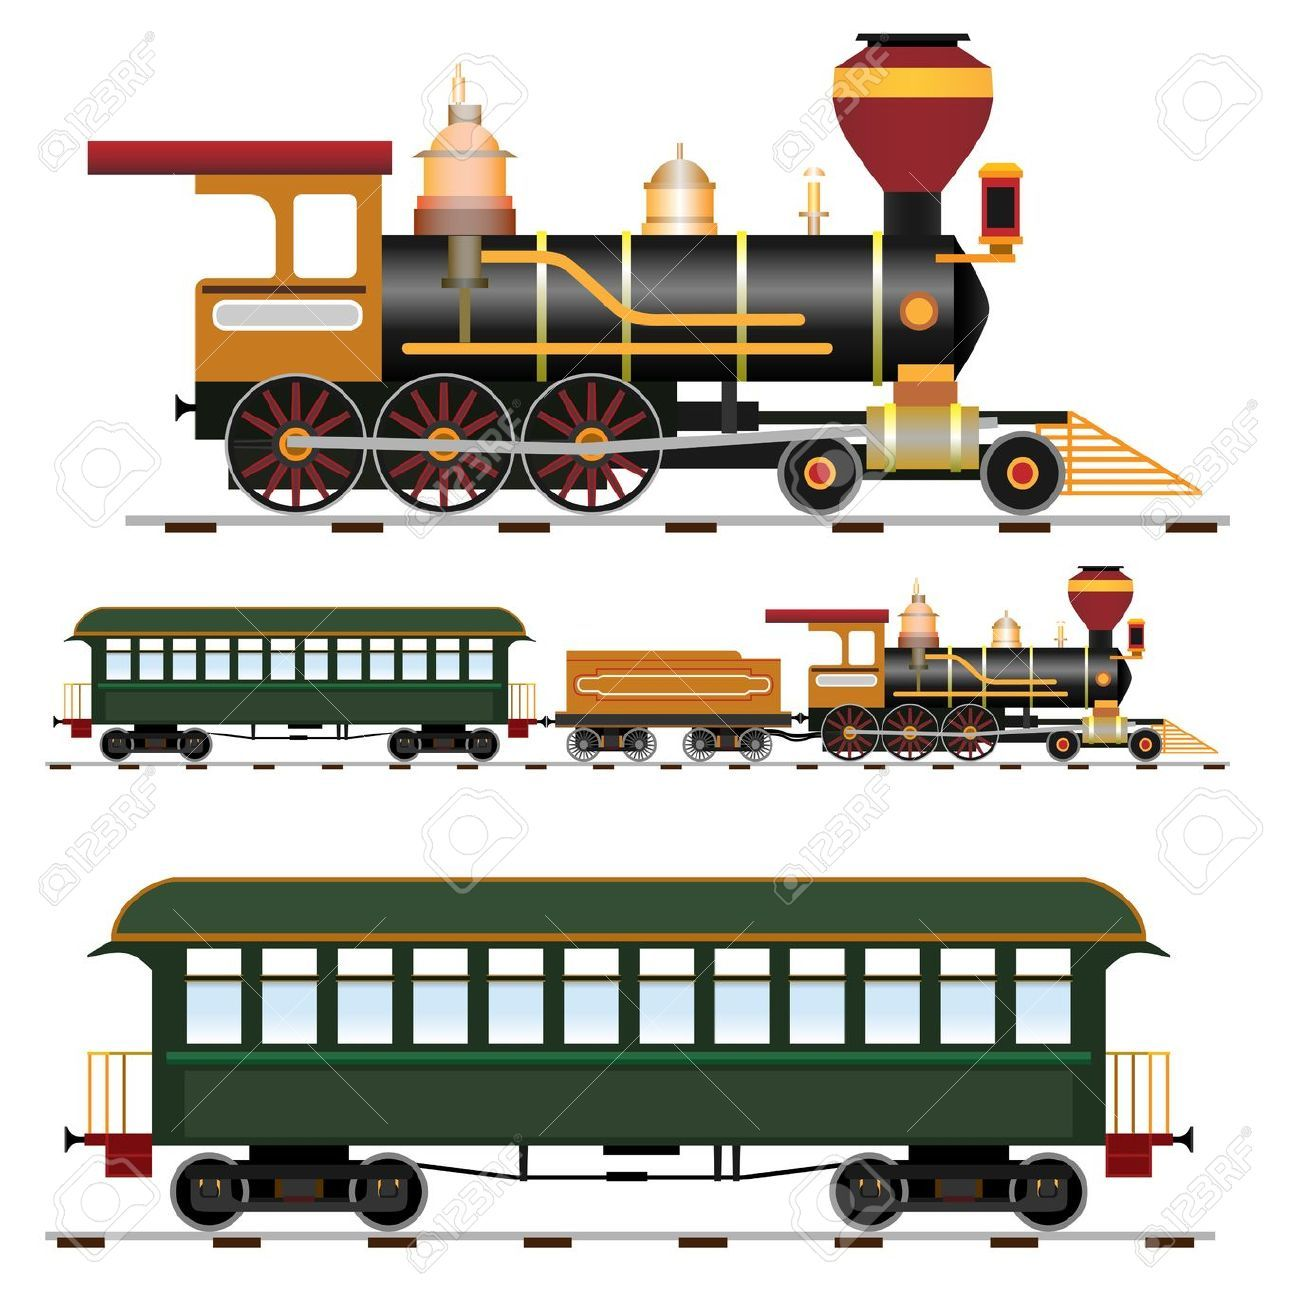 Train dessin stylis recherche google tatouages - Dessin train et wagon ...